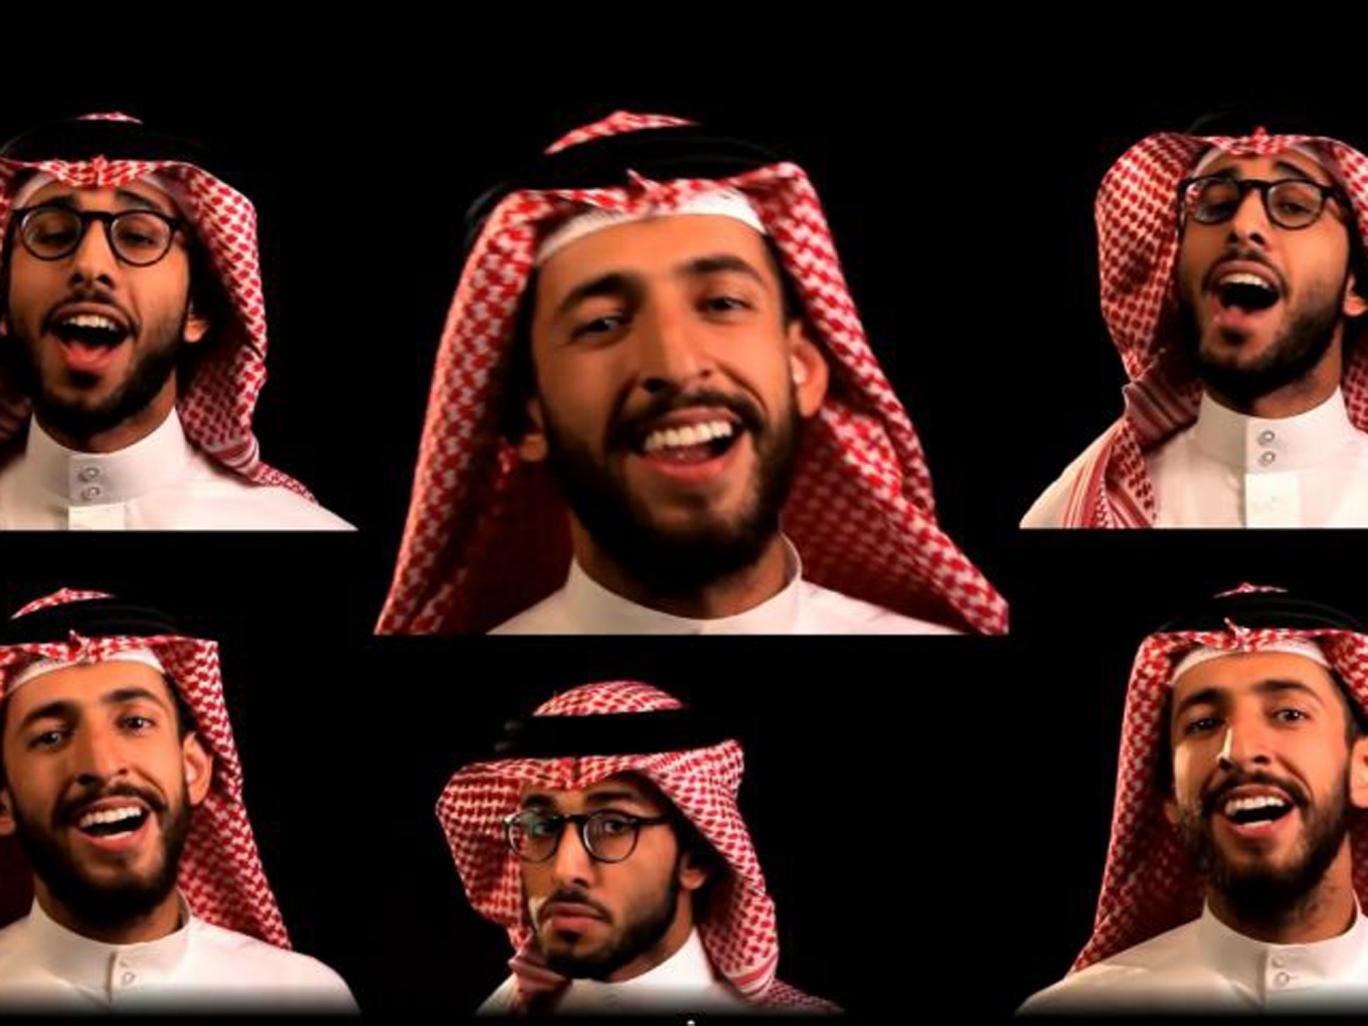 "Hisham Fageeh  sings""No Woman, No Drive"" on YouTube"